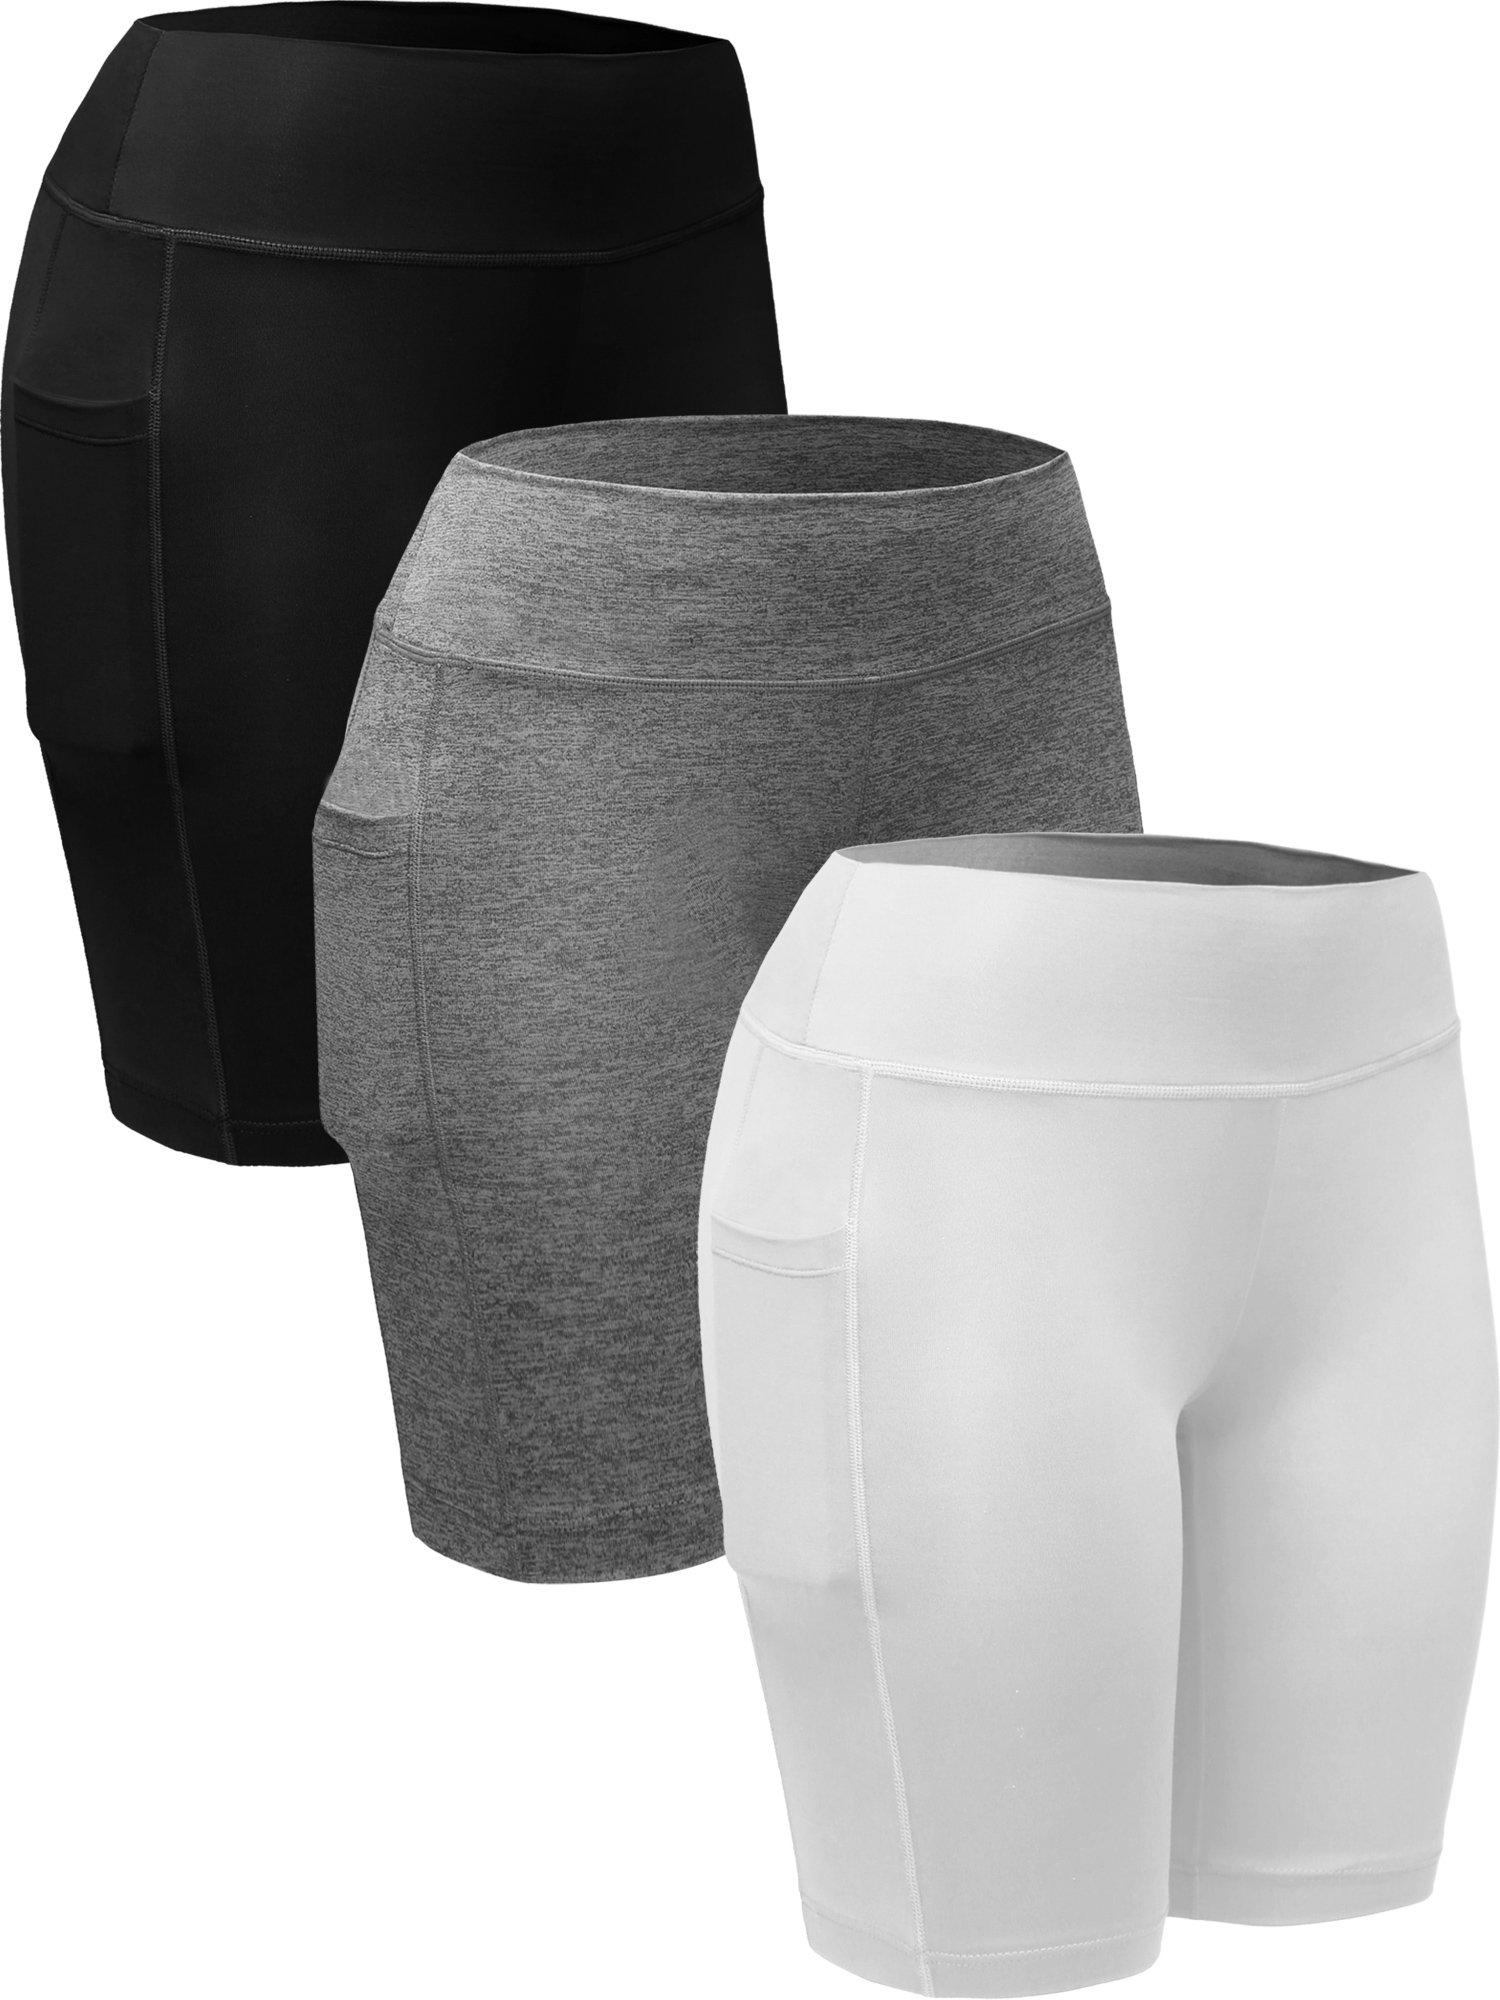 Neleus Women's Workout Compression Long Shorts with Pocket,9005,3 Pack,Black,Grey,White,US XL,EU 2XL